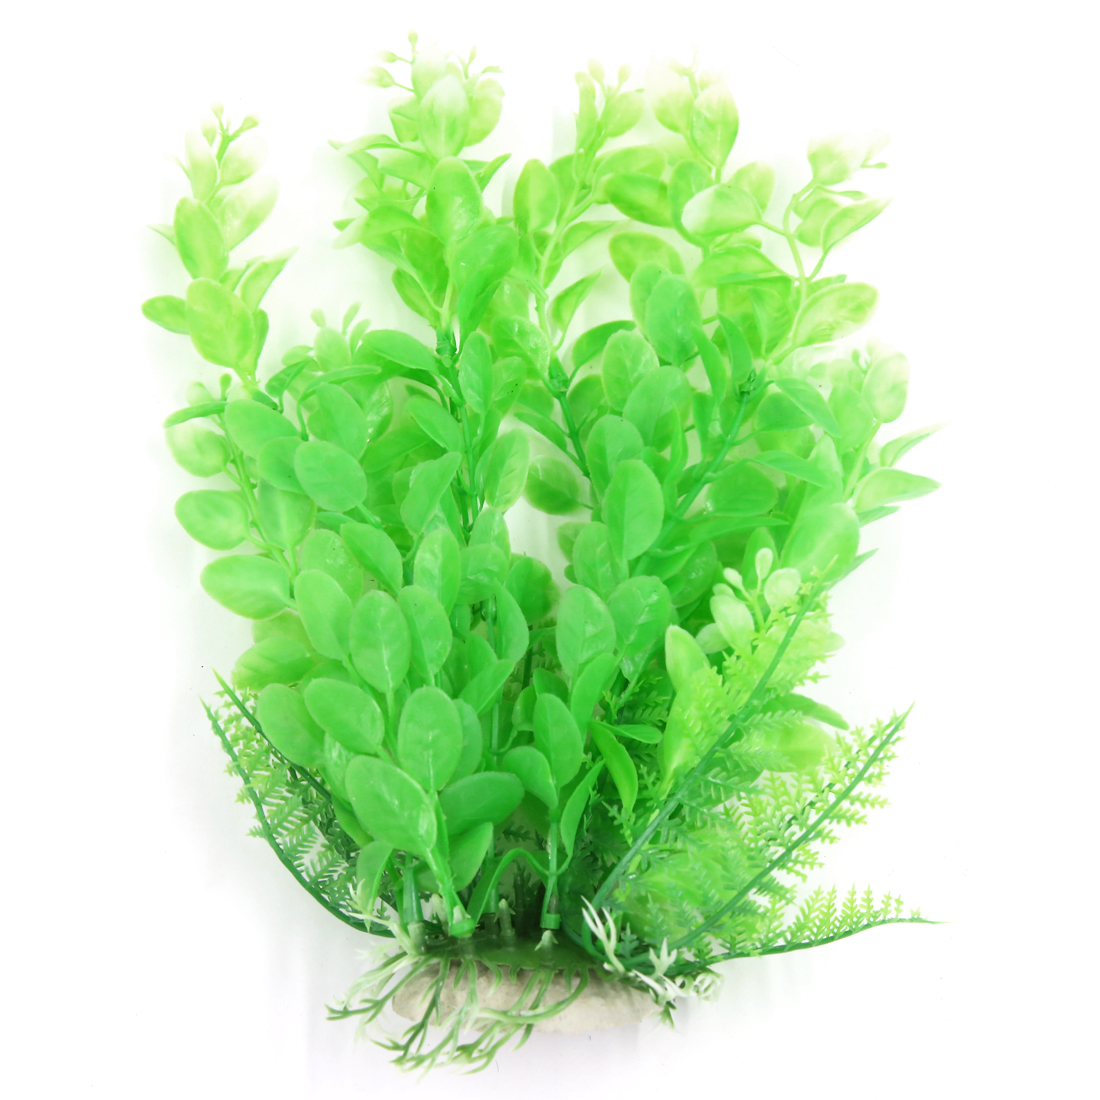 Aqua Landscape Fish Tank Decoration Green Plastic Plant for Betta 22cm